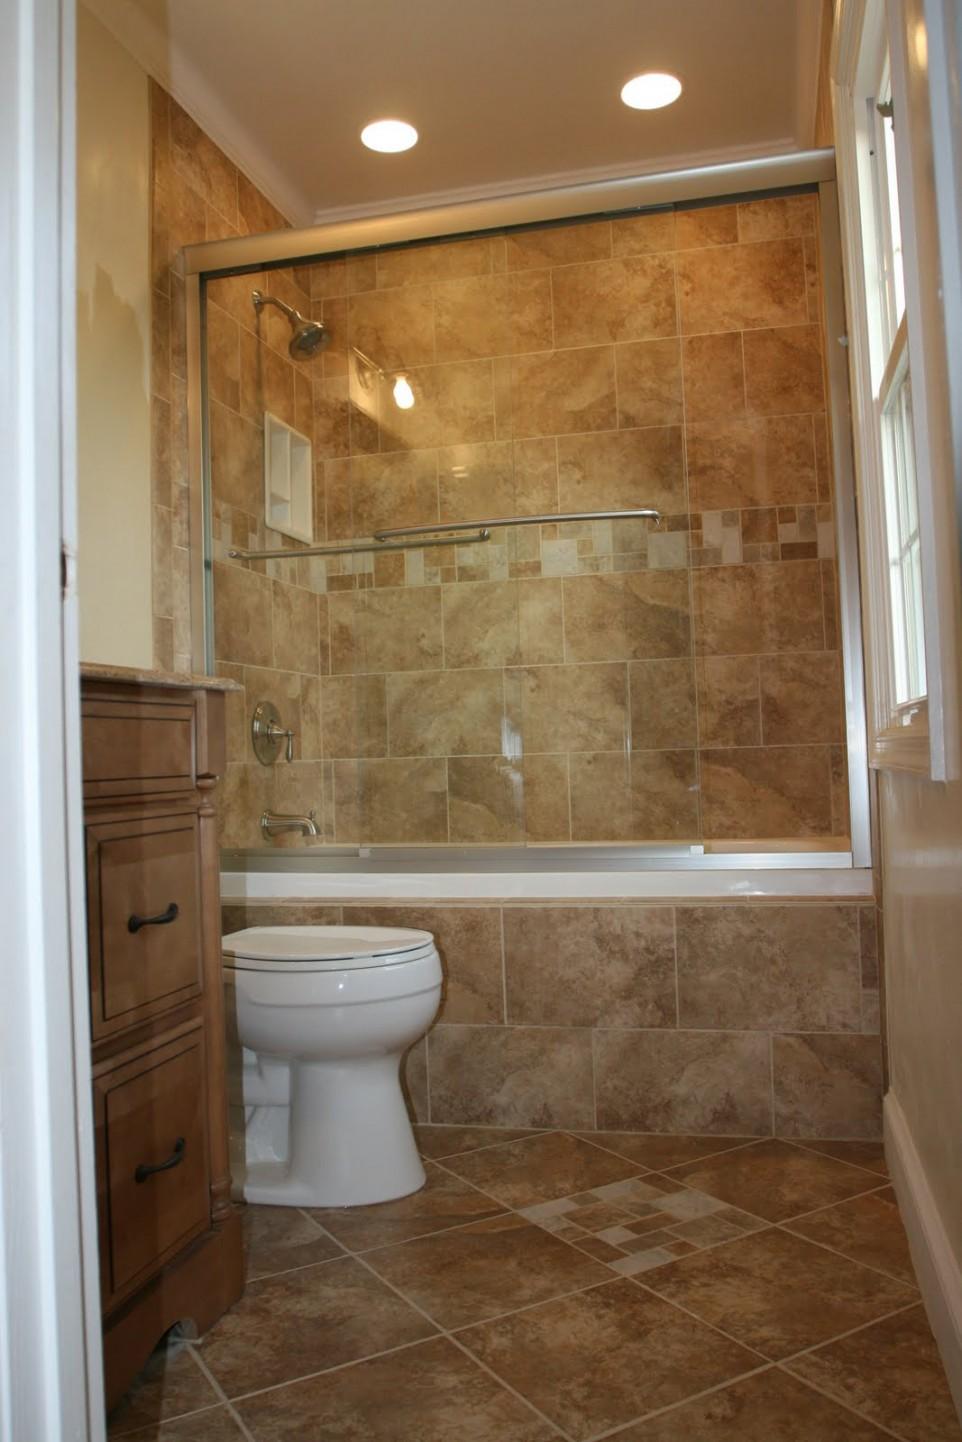 layout-bathroom-remodel-ideas